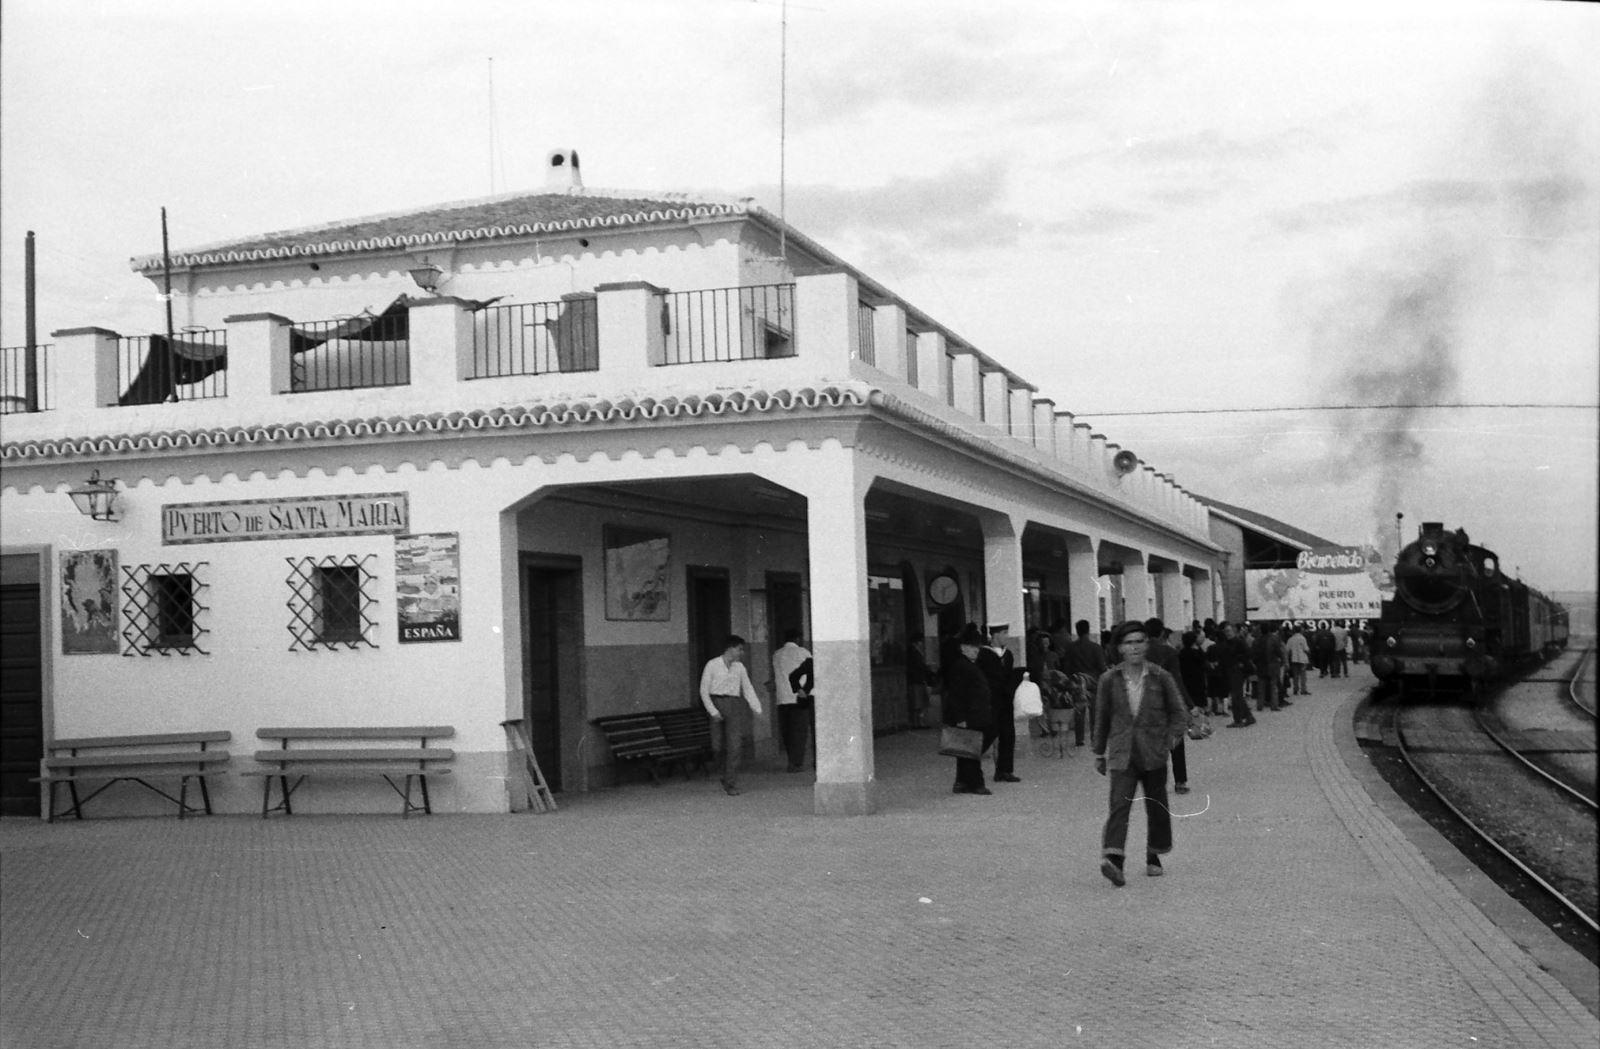 Foto: Archivo Histórico Ferroviario del Museo del Ferrocarril de Madrid (CABRERA PÉREZ-CABALLERO, JUAN BAUTISTA).